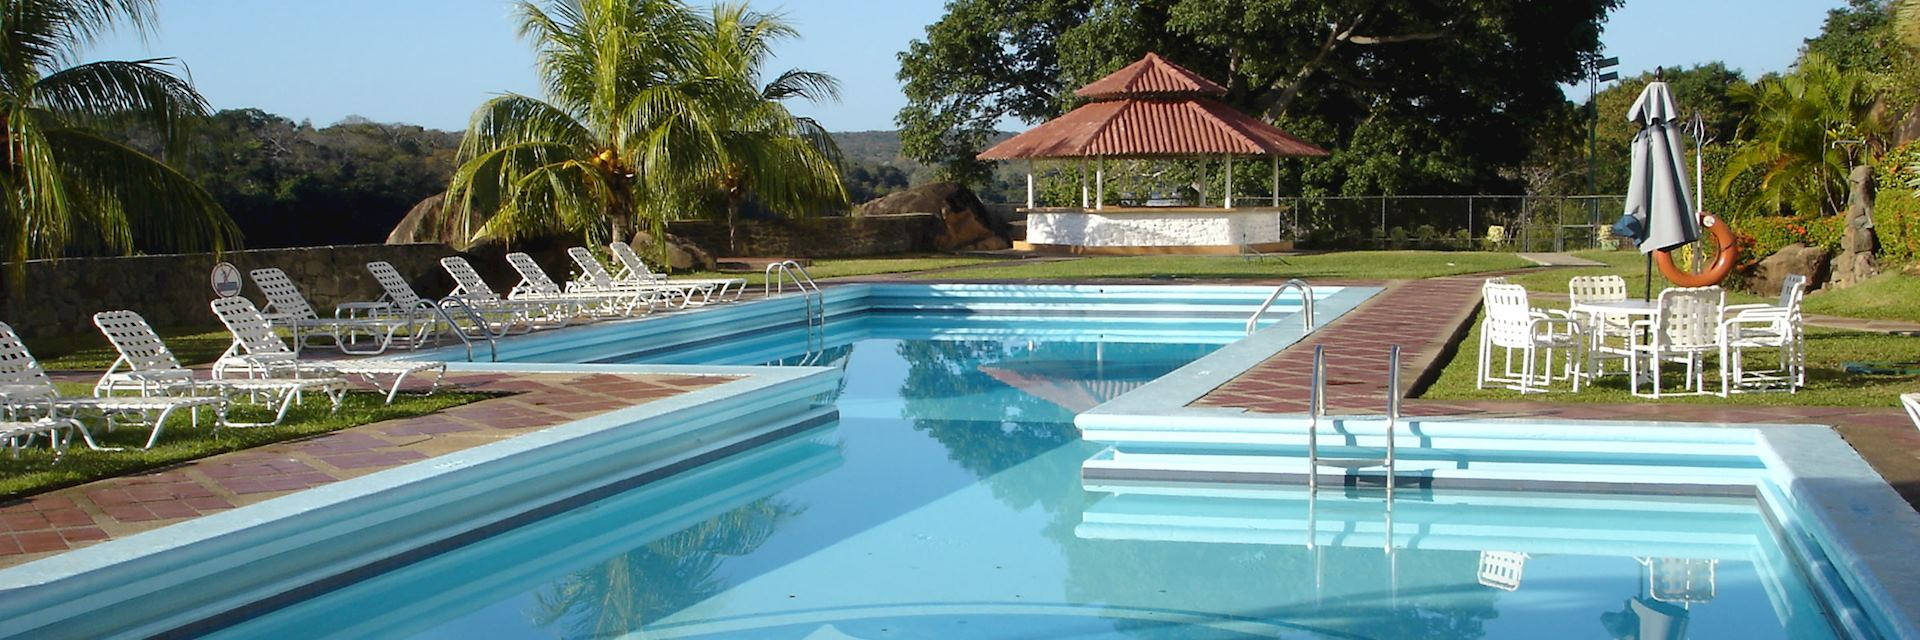 Intercontinental Guayana, Puerto Ordaz